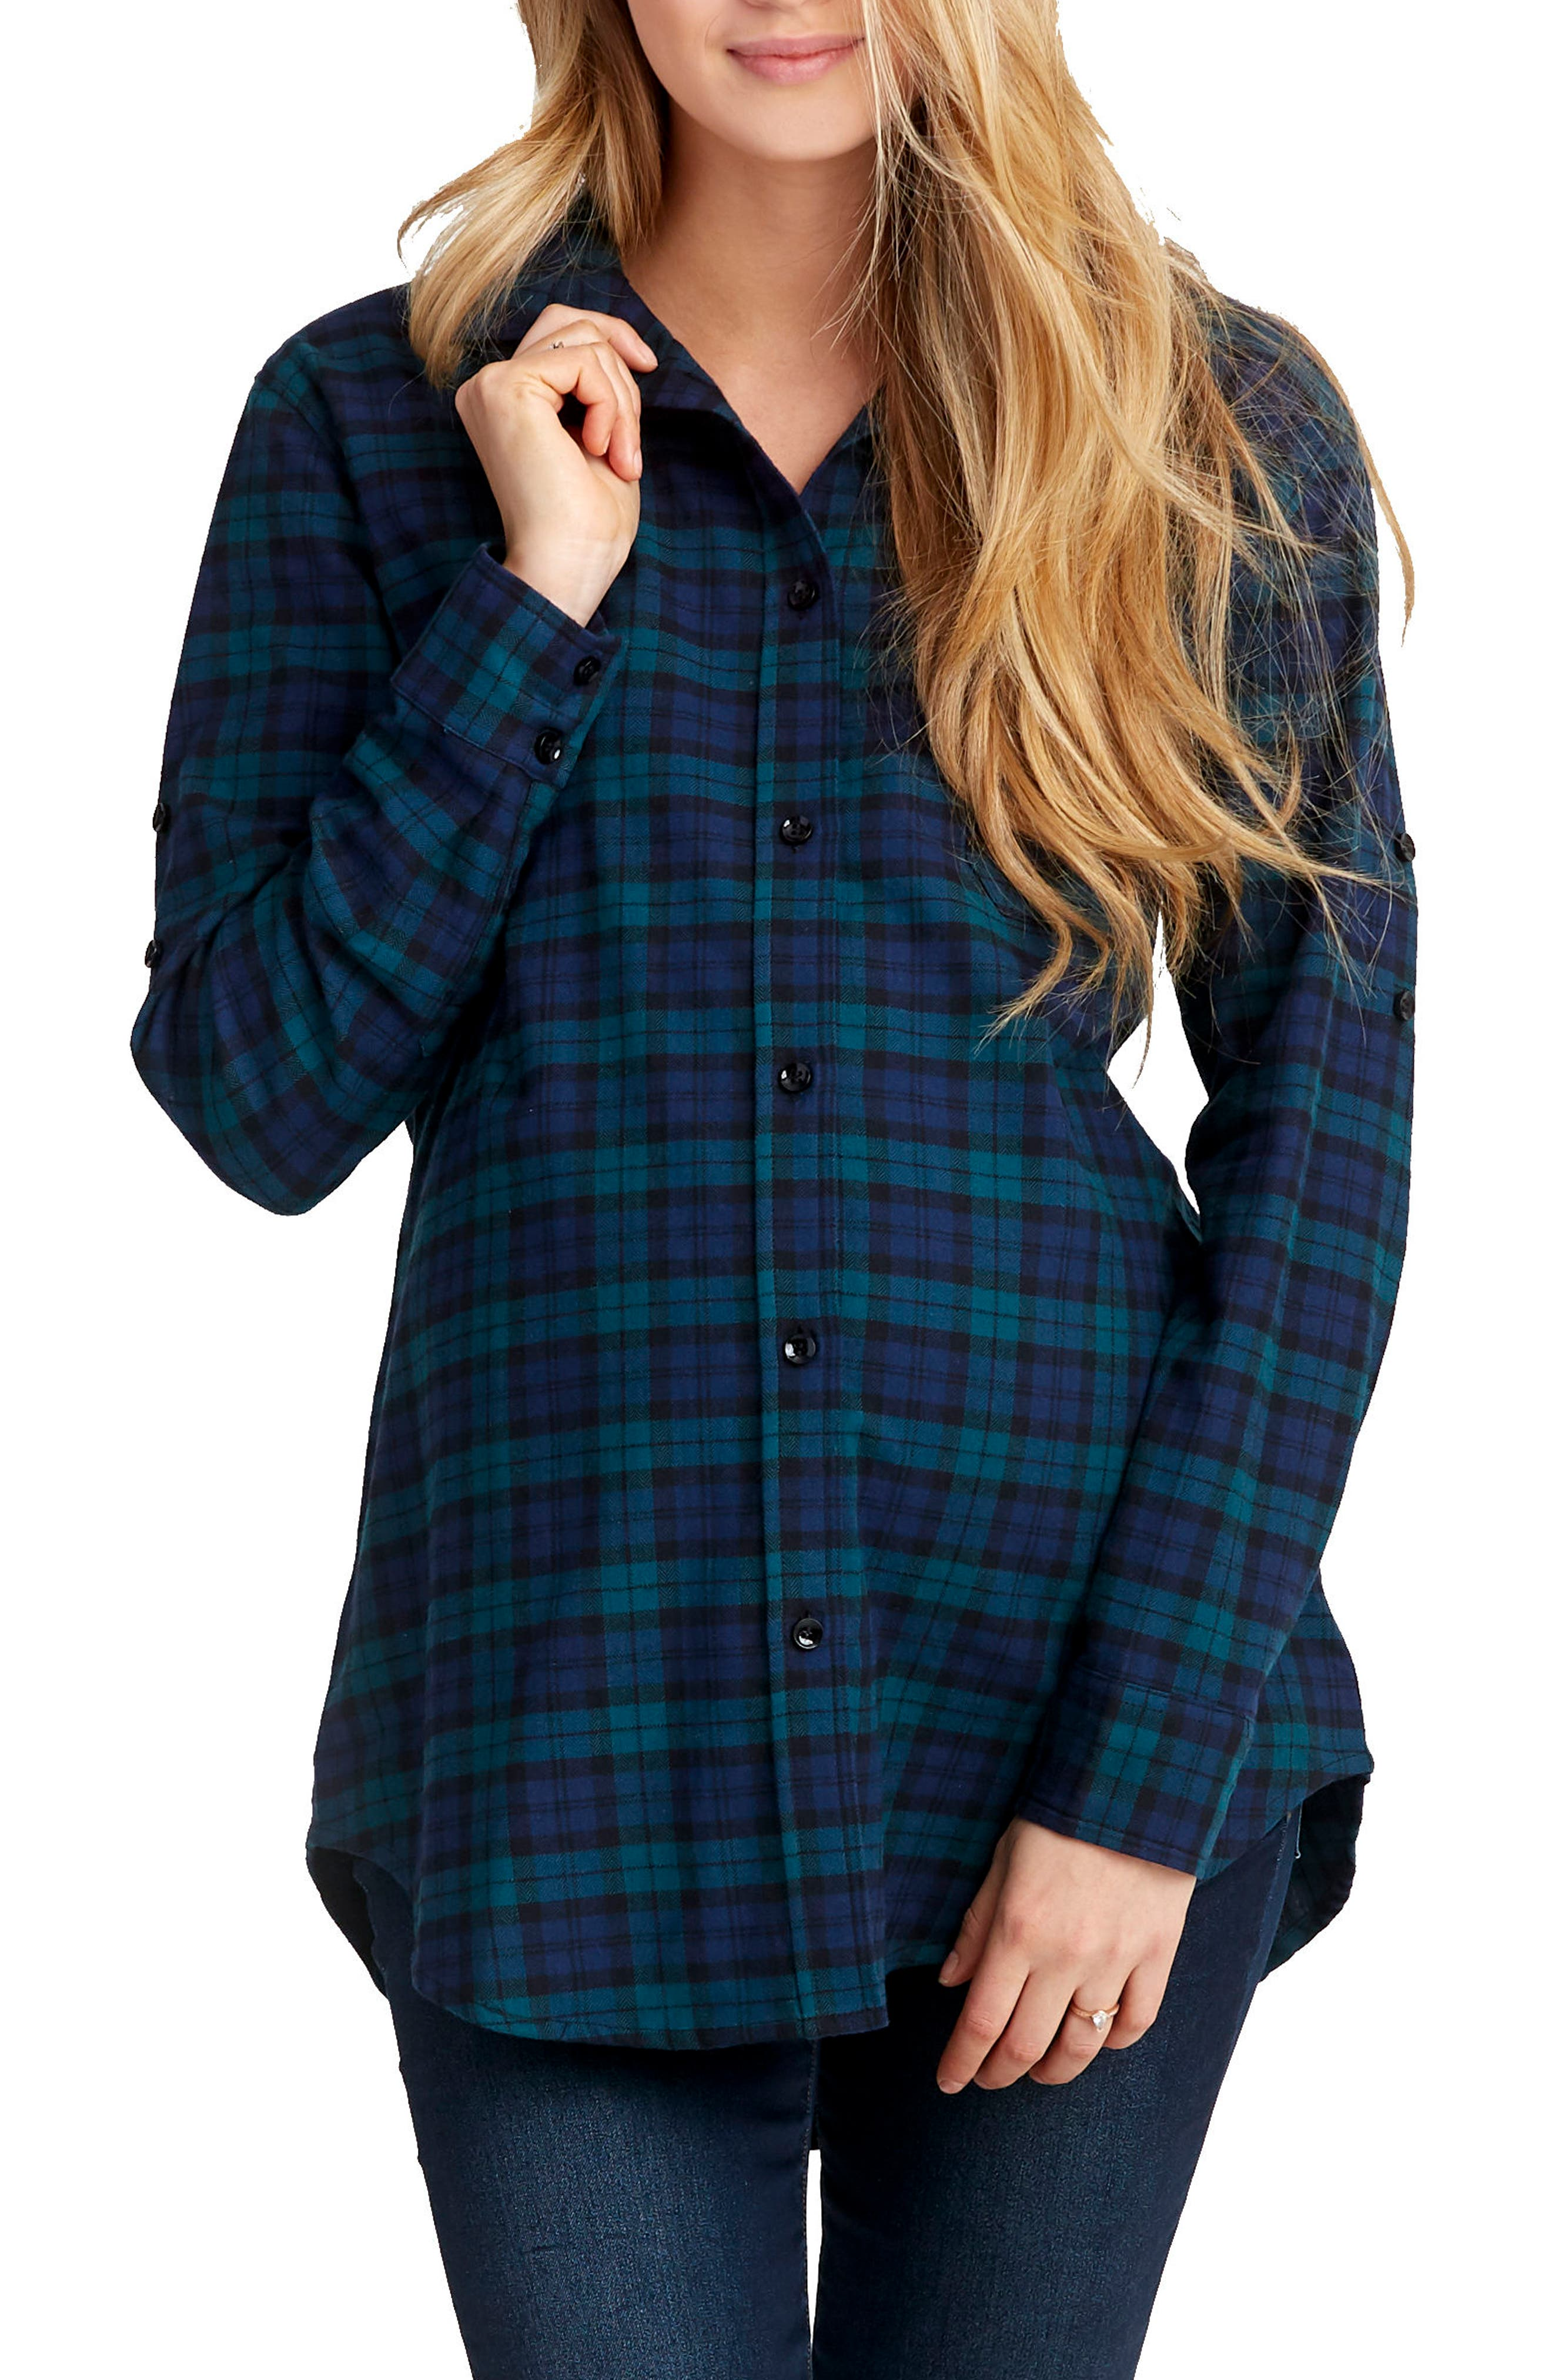 Sadie Maternity/Nursing Shirt,                         Main,                         color, BLUE GREEN PLAID